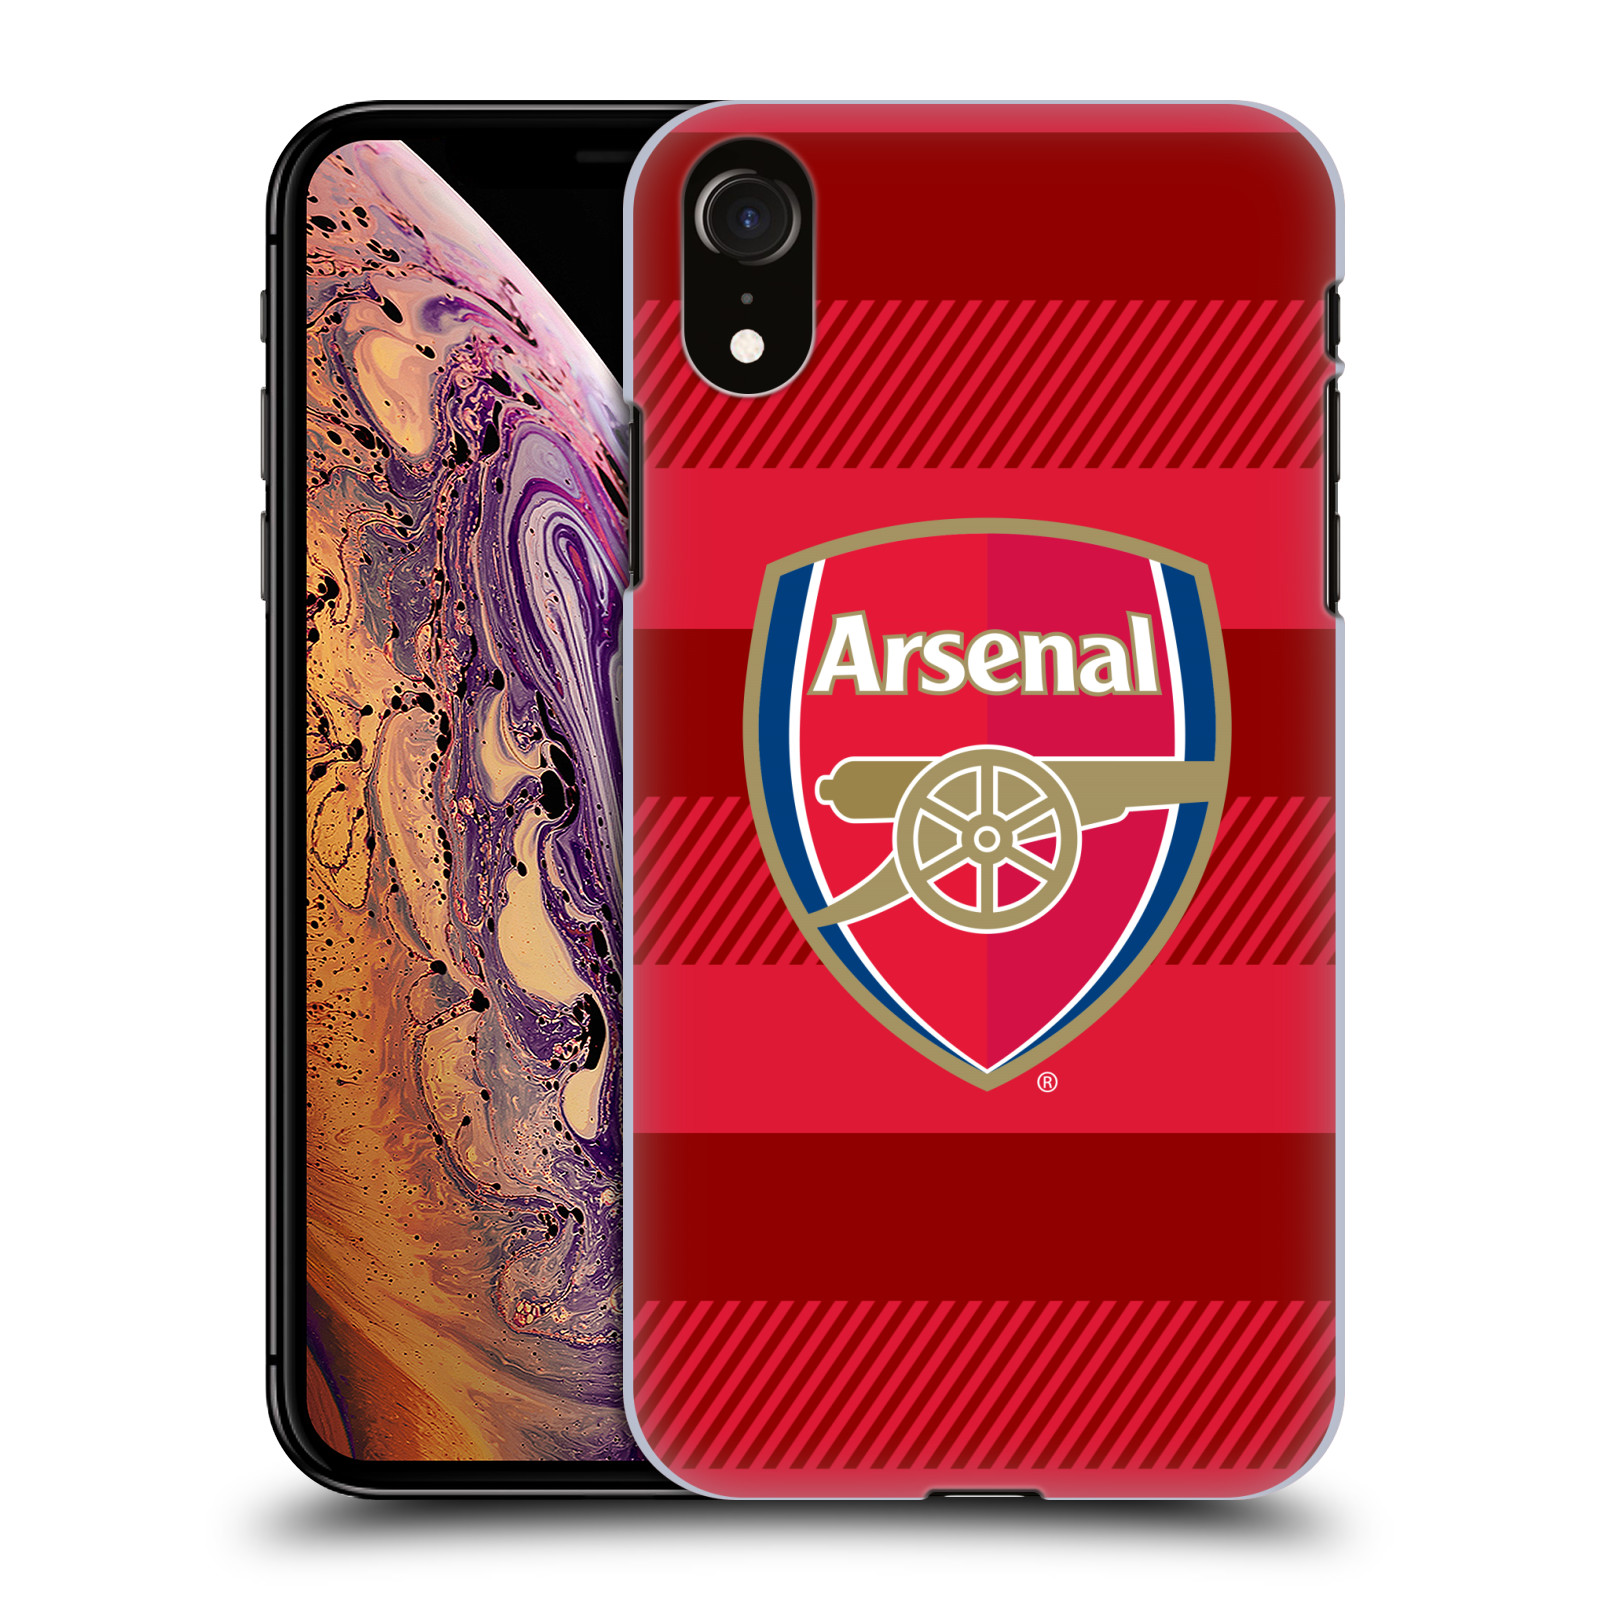 Plastové pouzdro na mobil Apple iPhone XR - Head Case - Arsenal FC - Logo s pruhy